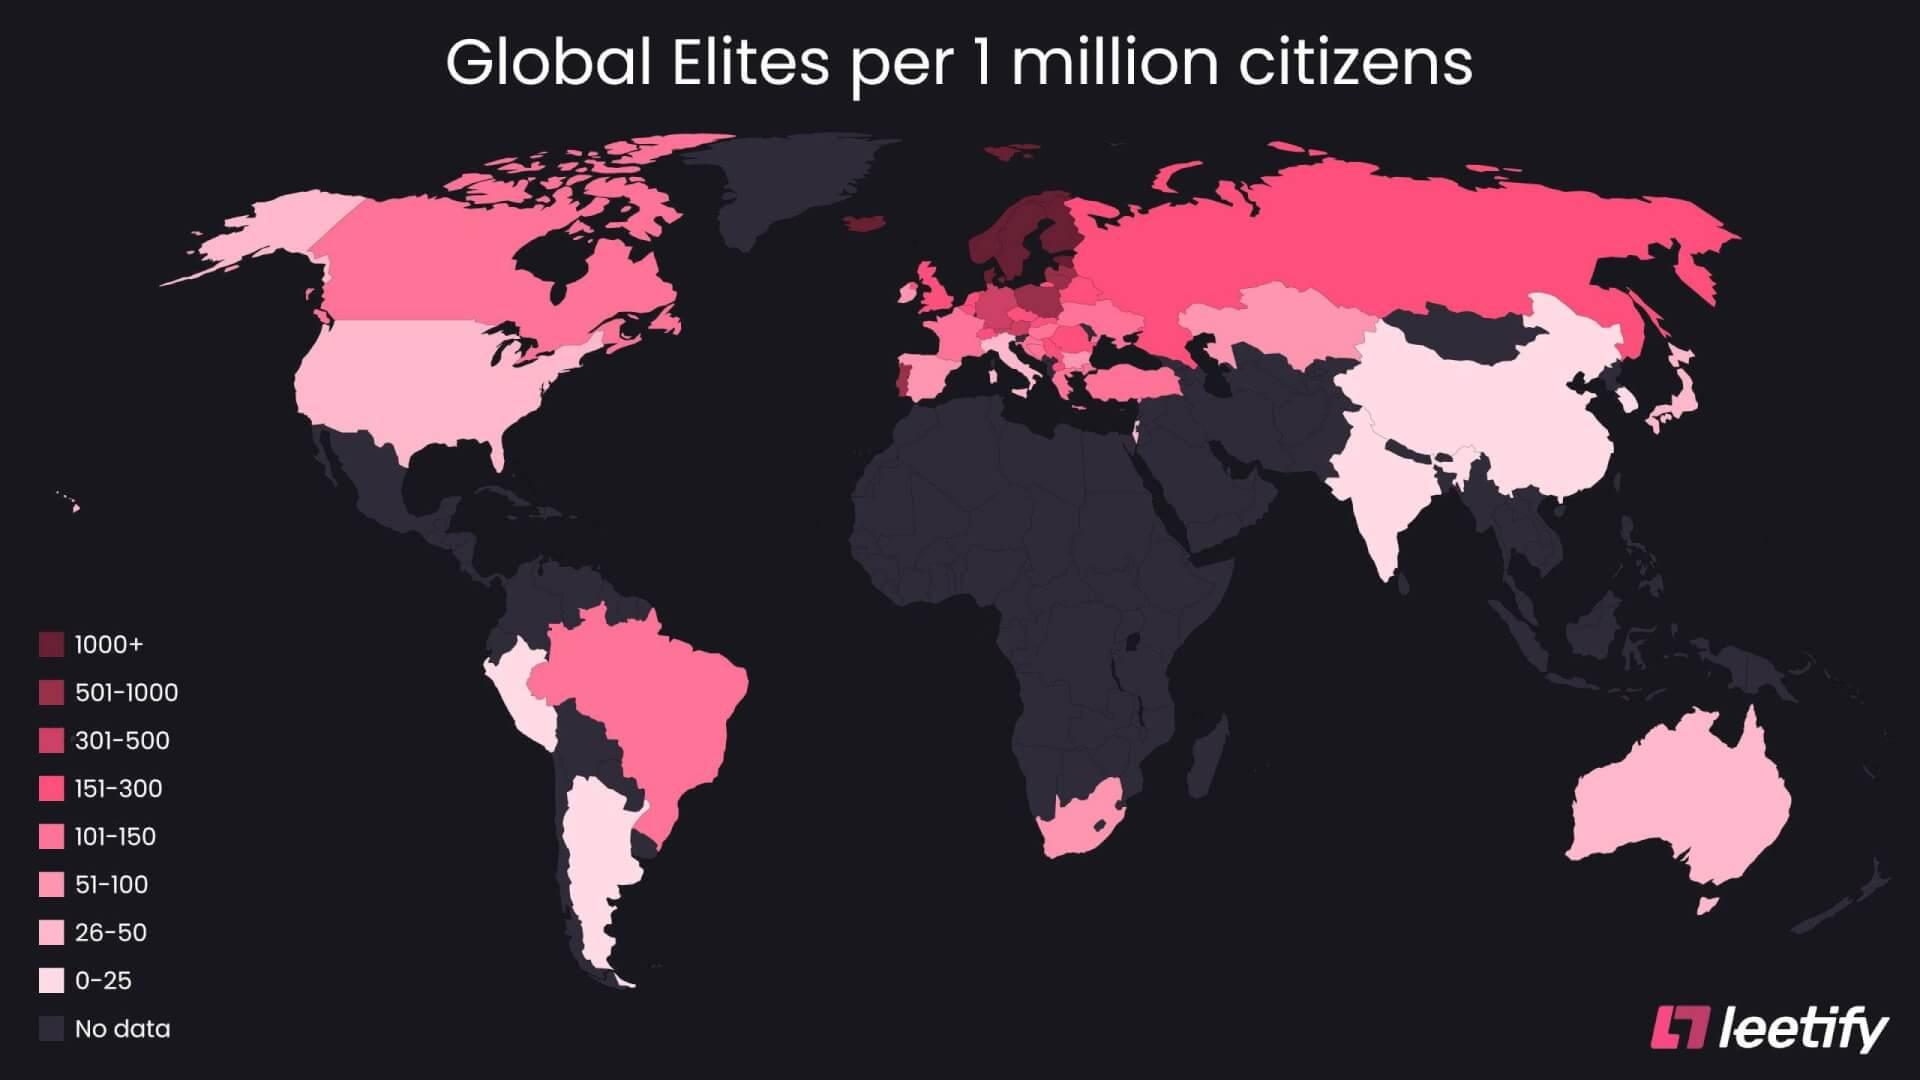 Global elite- csgo